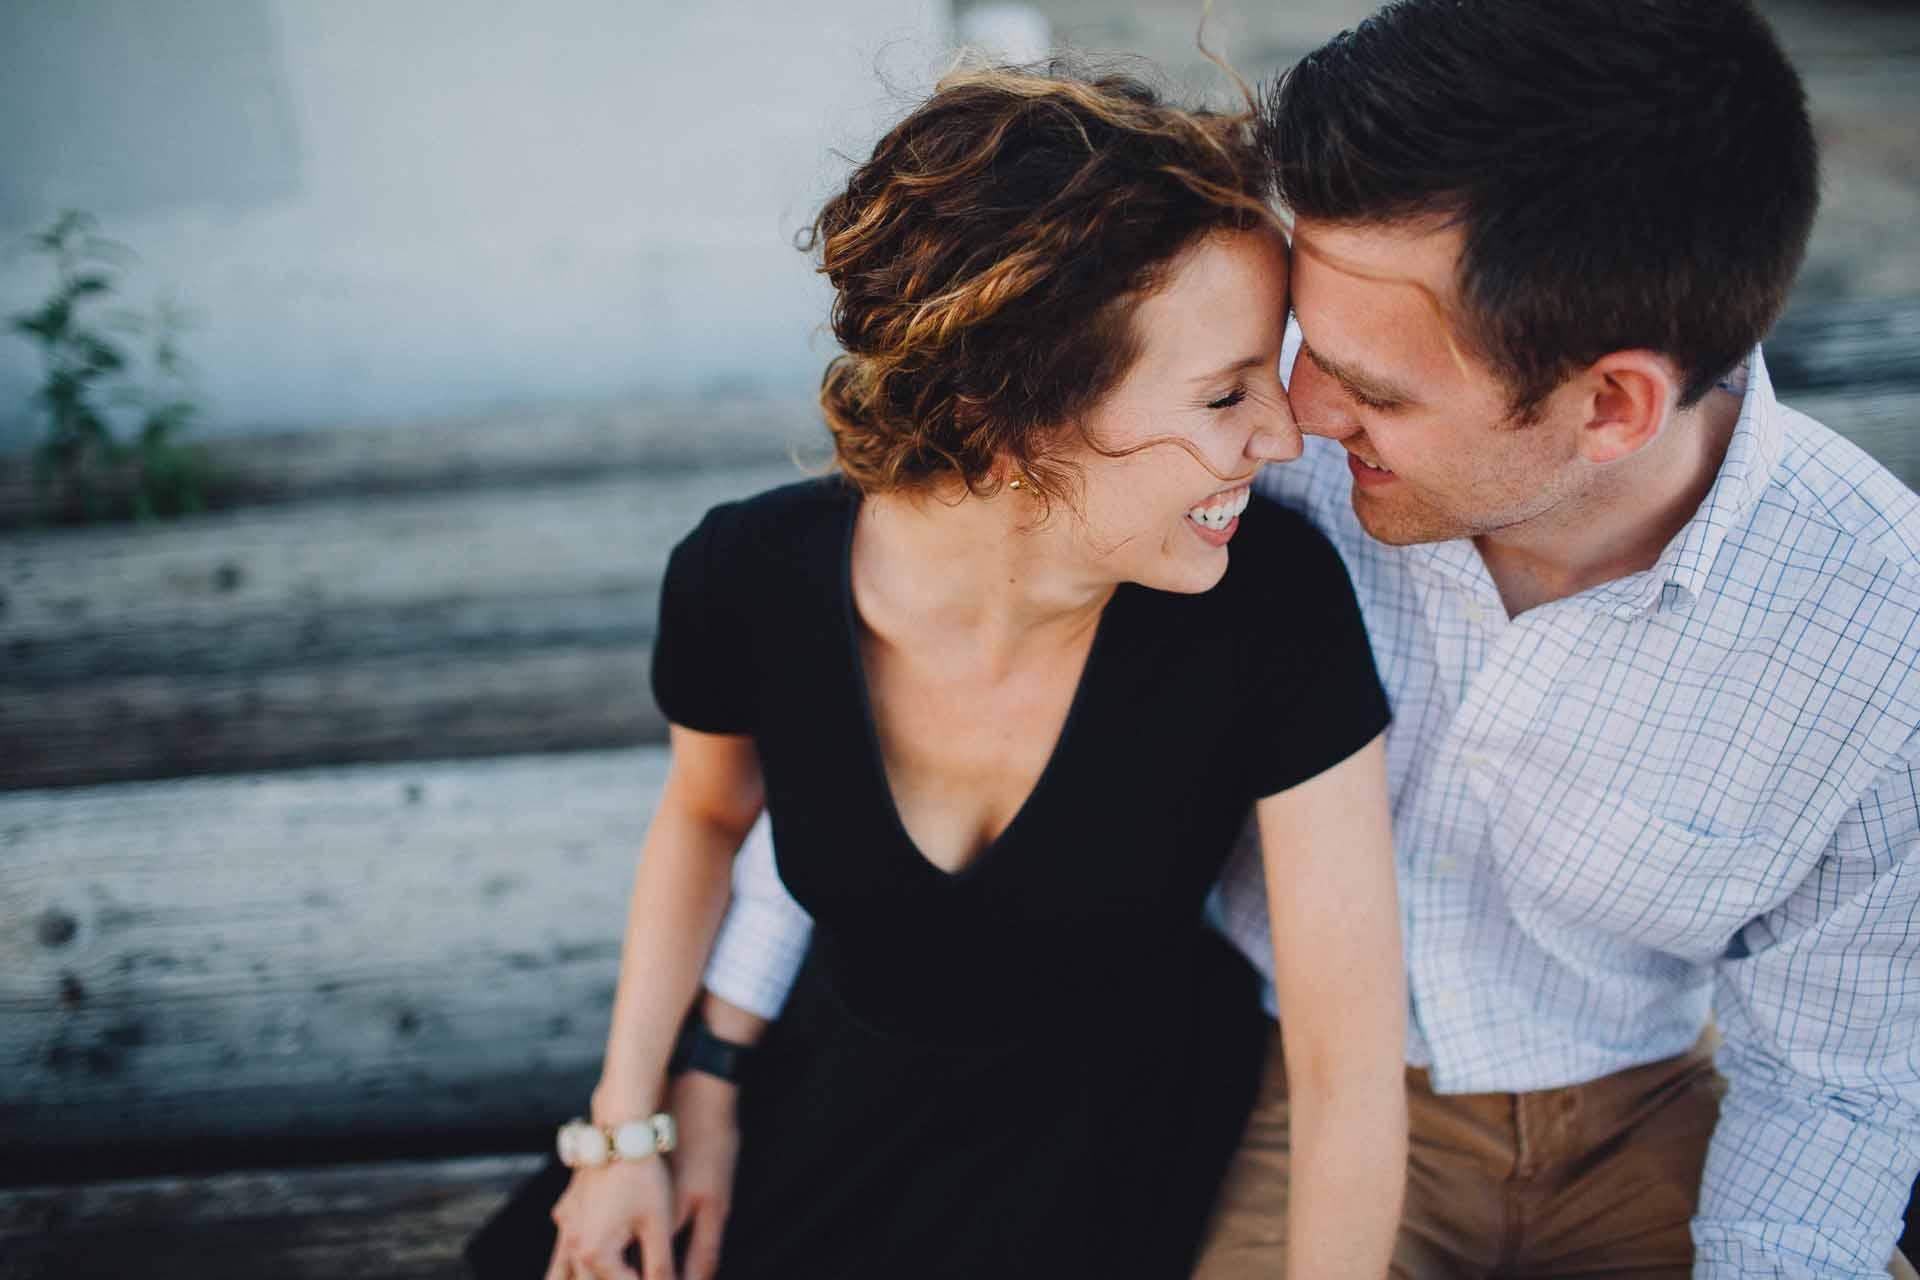 Emily-Dan-Dayton-Engagement-025@2x.jpg